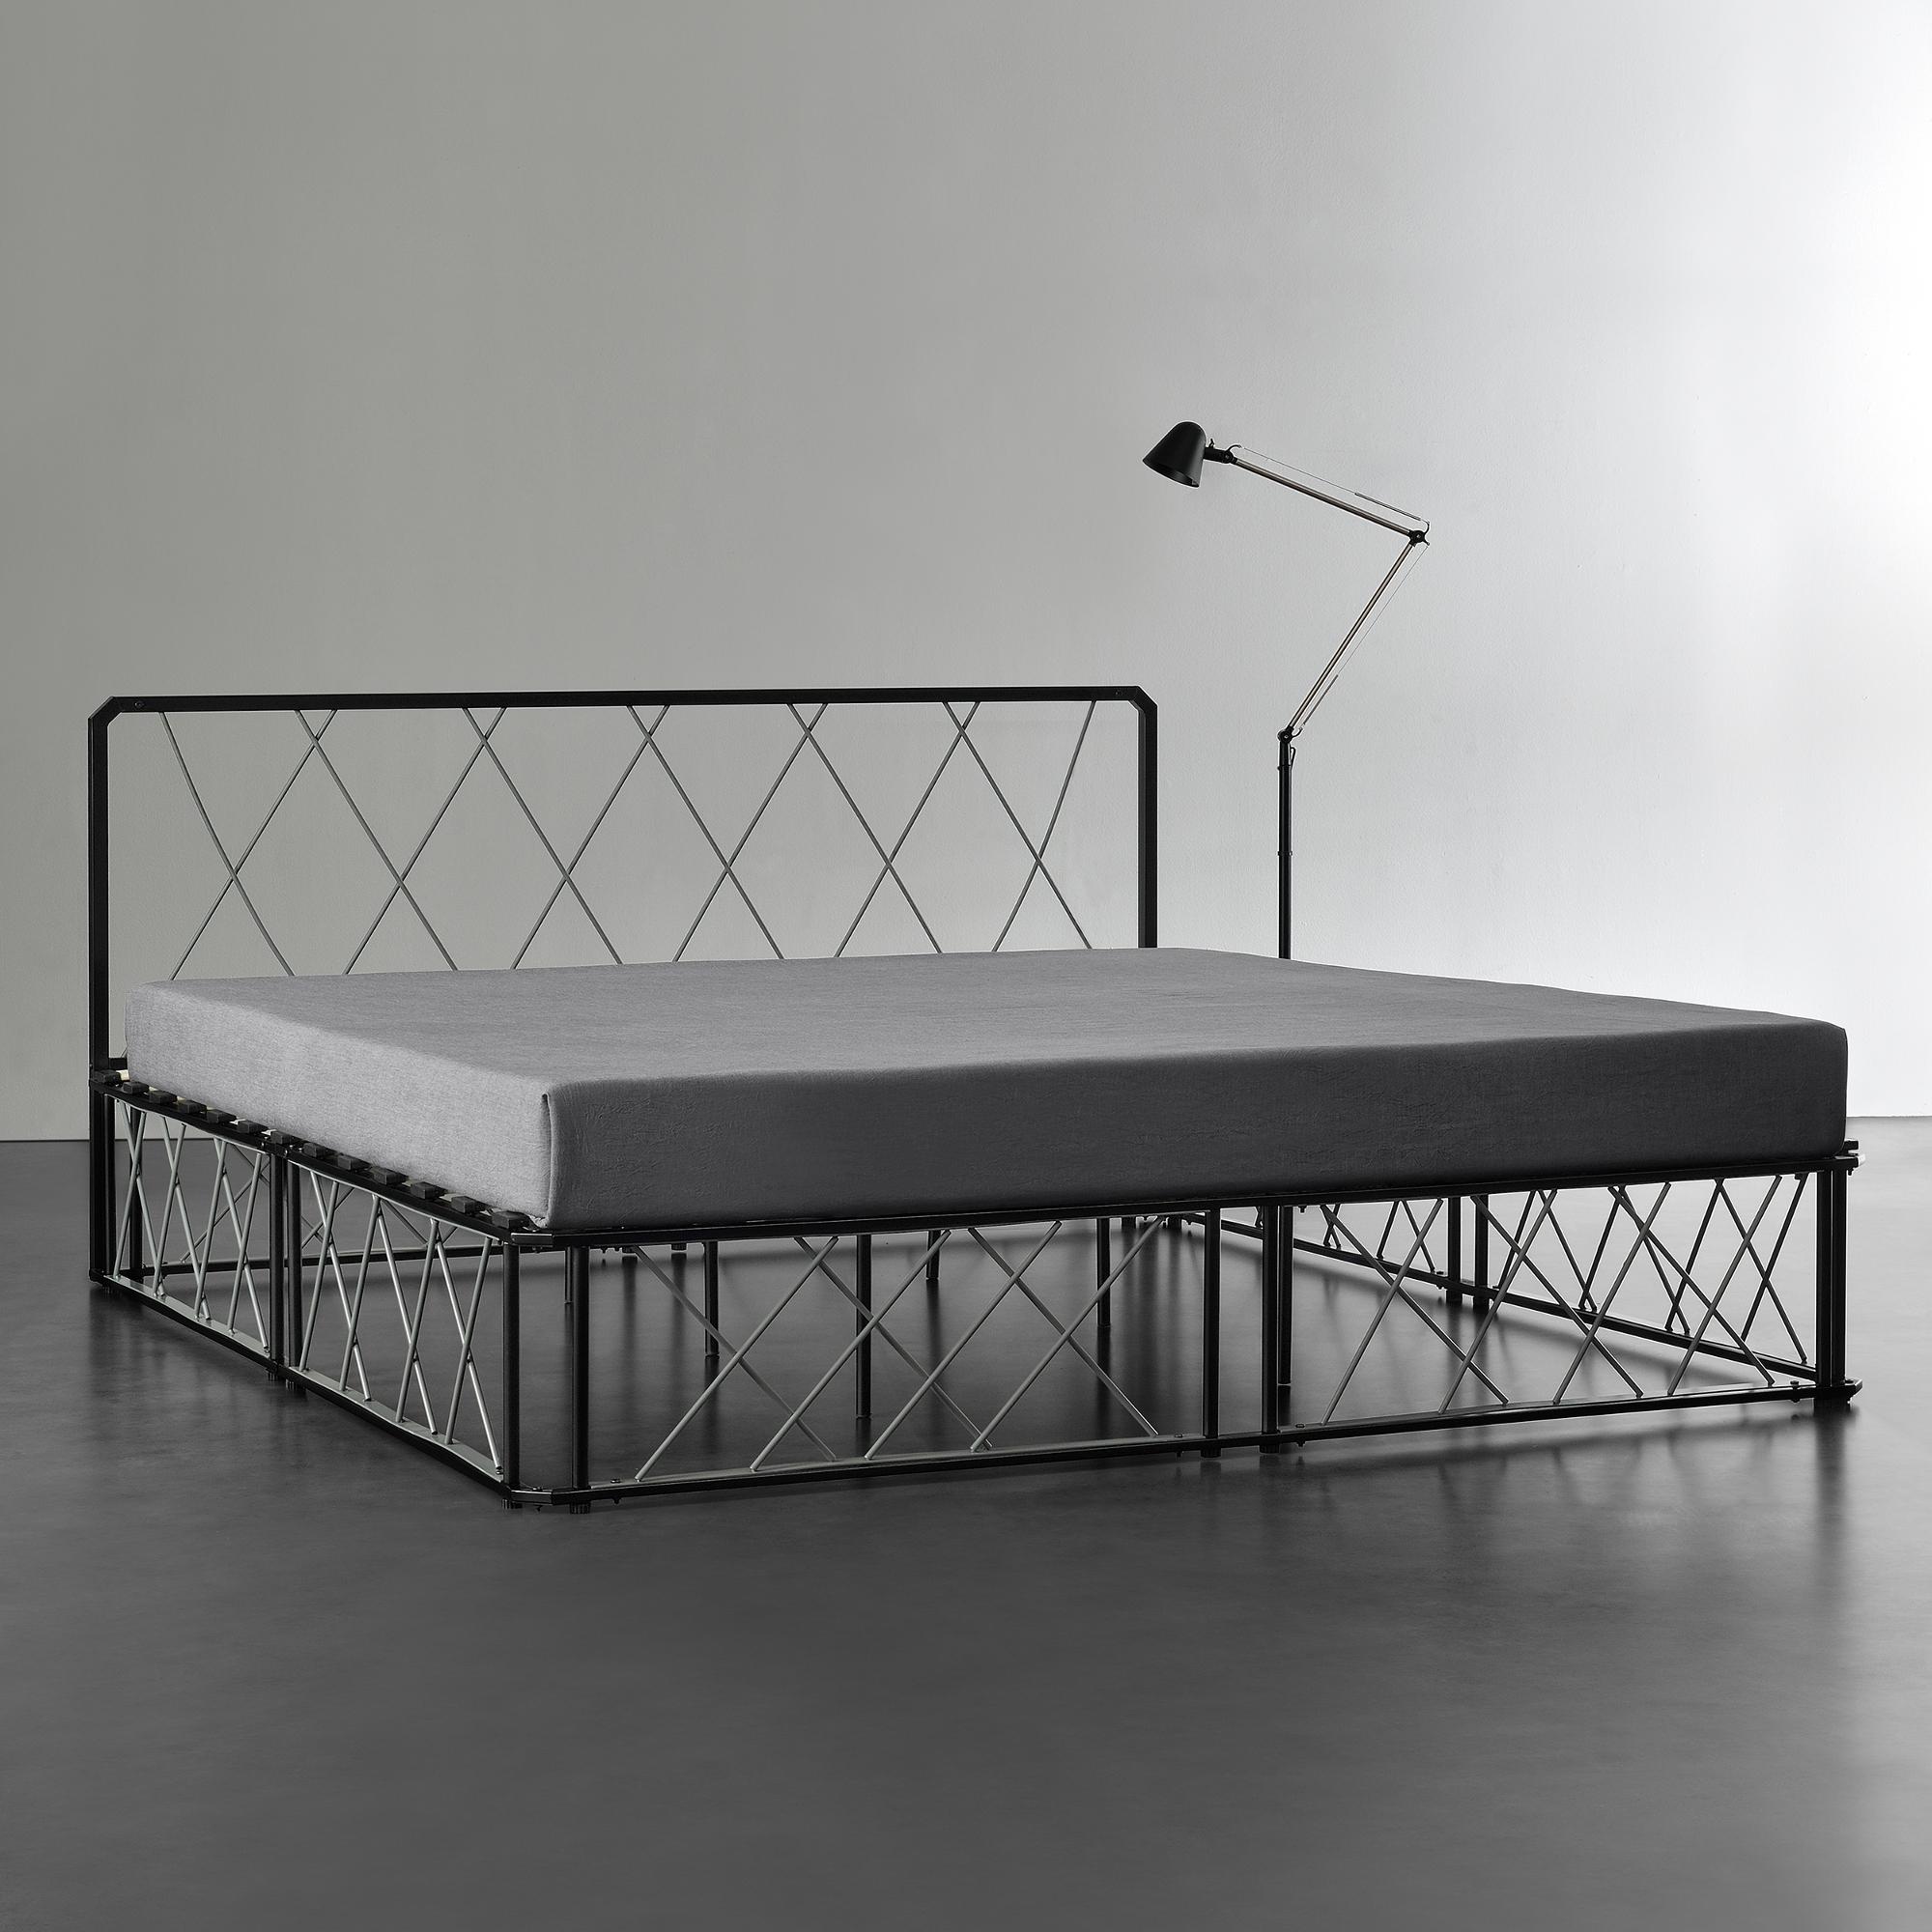 en.casa] Metallbett 140 180 x200 Schwarz/Grau Matratze Design Bett ...